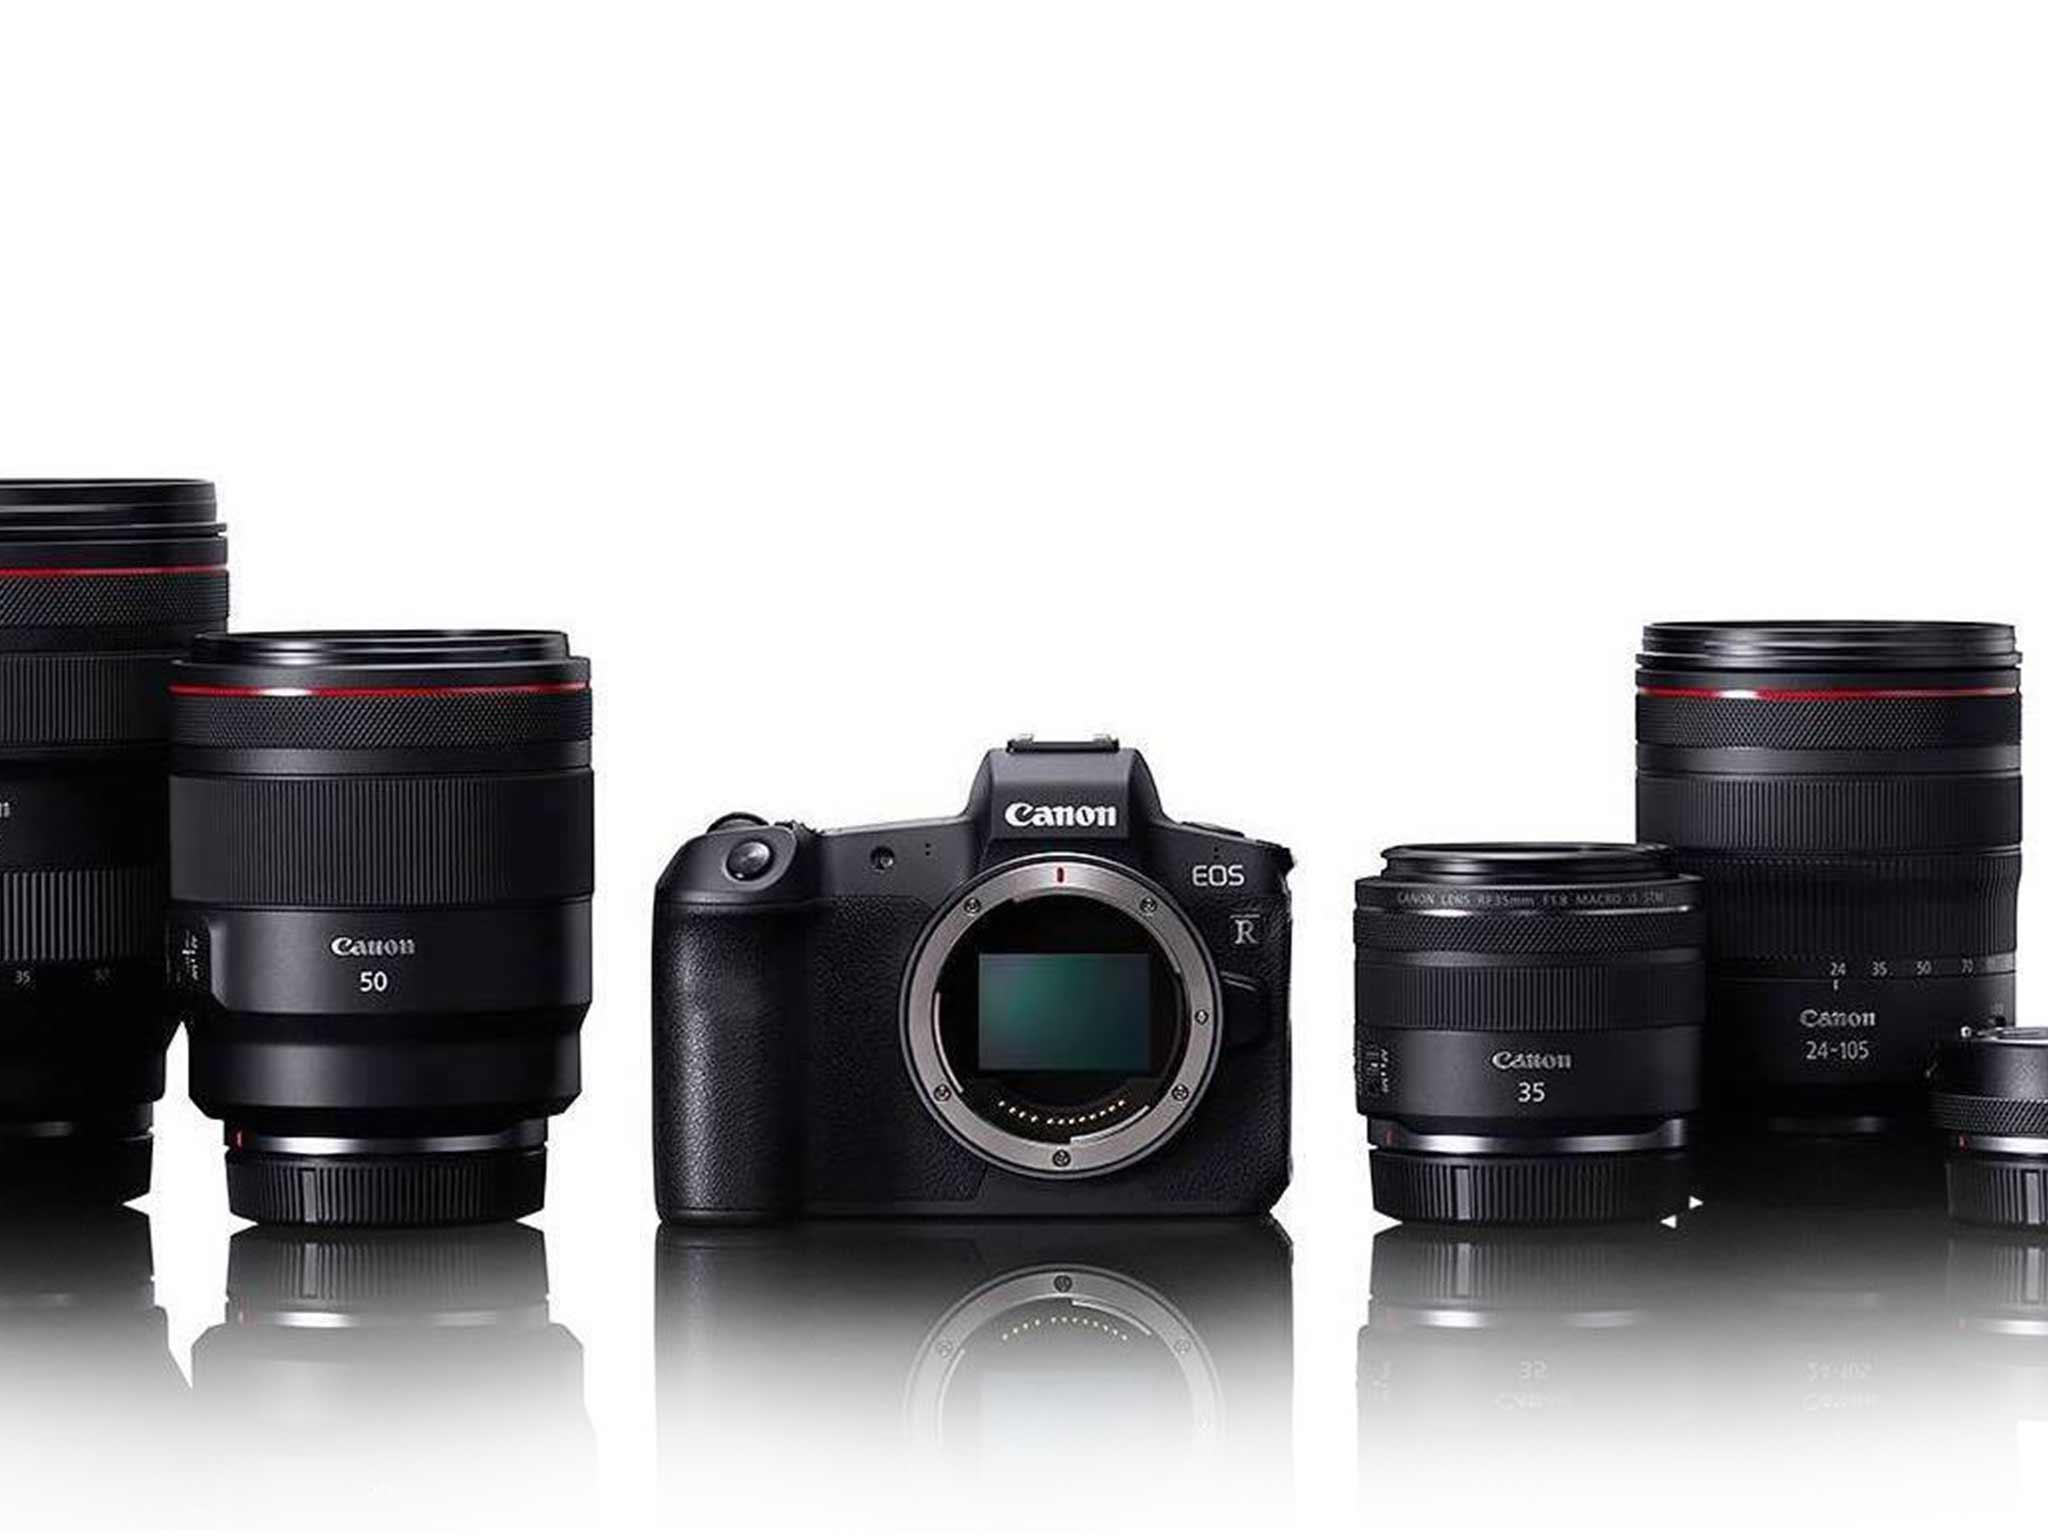 Canon 隆重推出全新 EOS R 系統 擴充EOS系統相機及鏡頭 進一步實現更高的影像畫質、更佳的操作性及更寬廣的攝影可能性